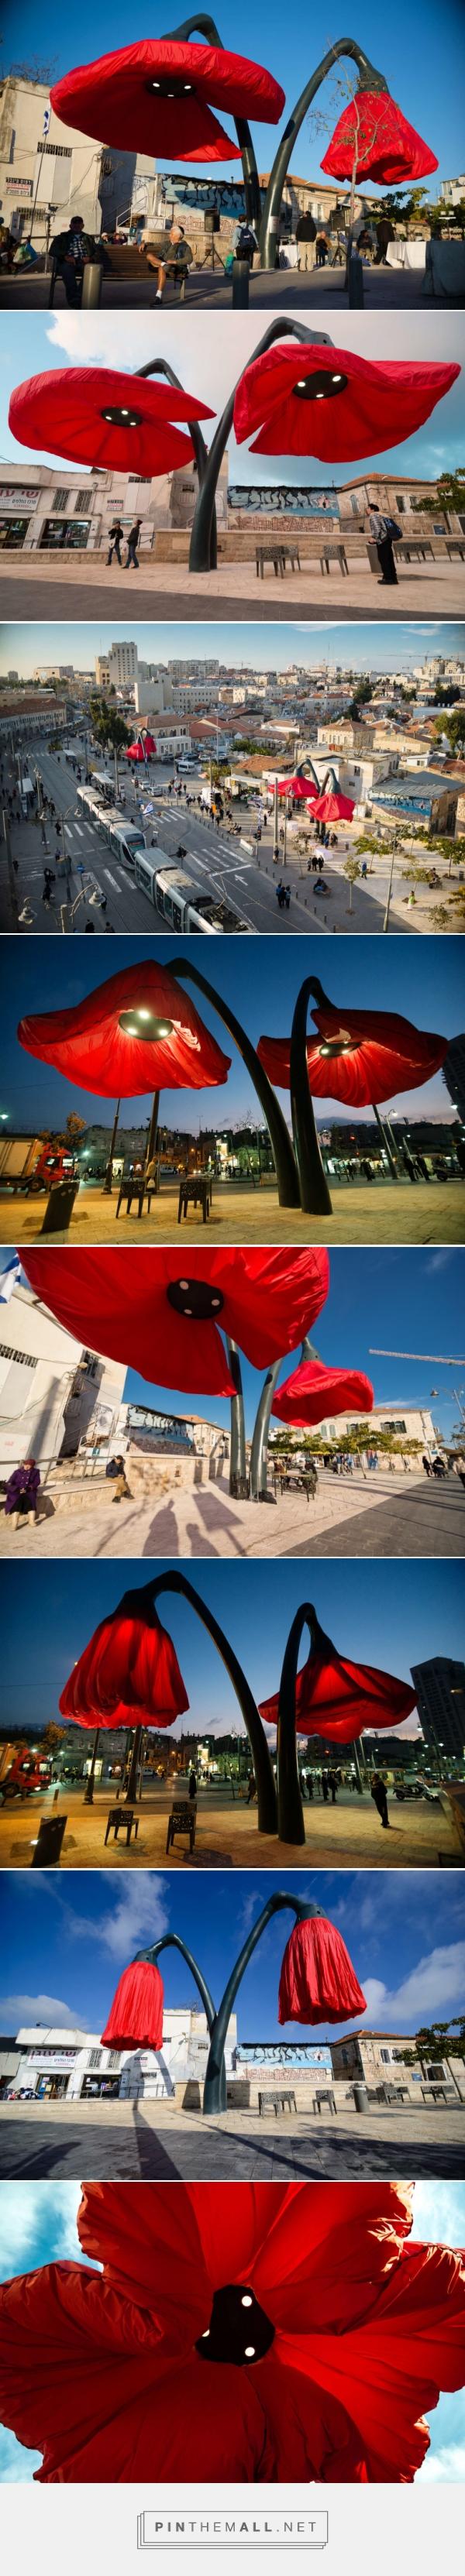 Maki na placu Valero I flowers on valero sqaure| Inspirowani Naturą